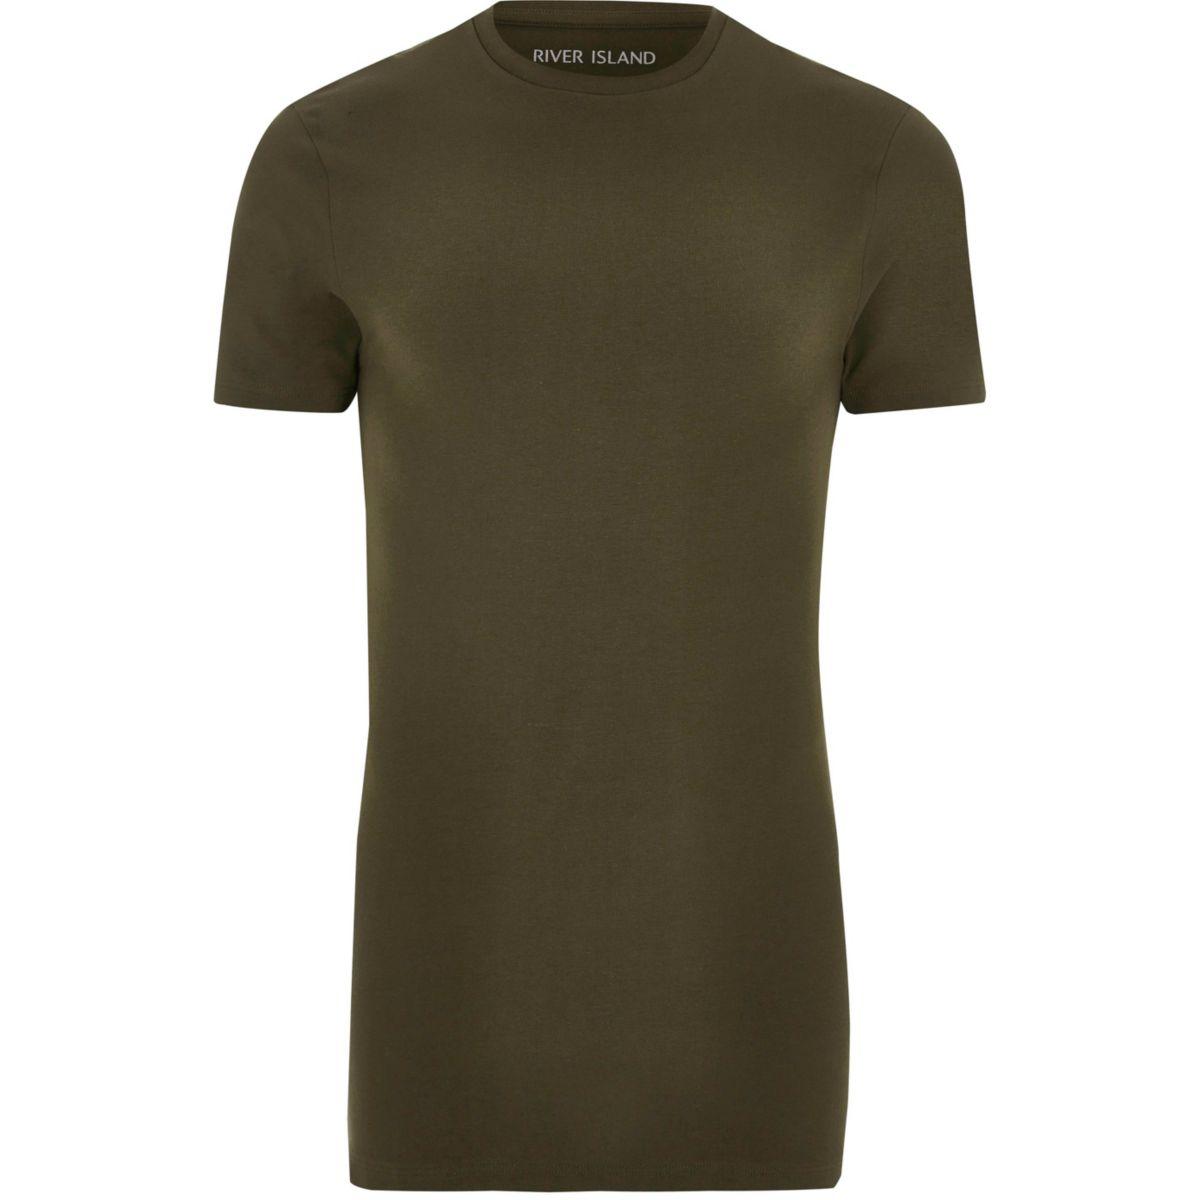 Khaki green longline muscle fit T-shirt